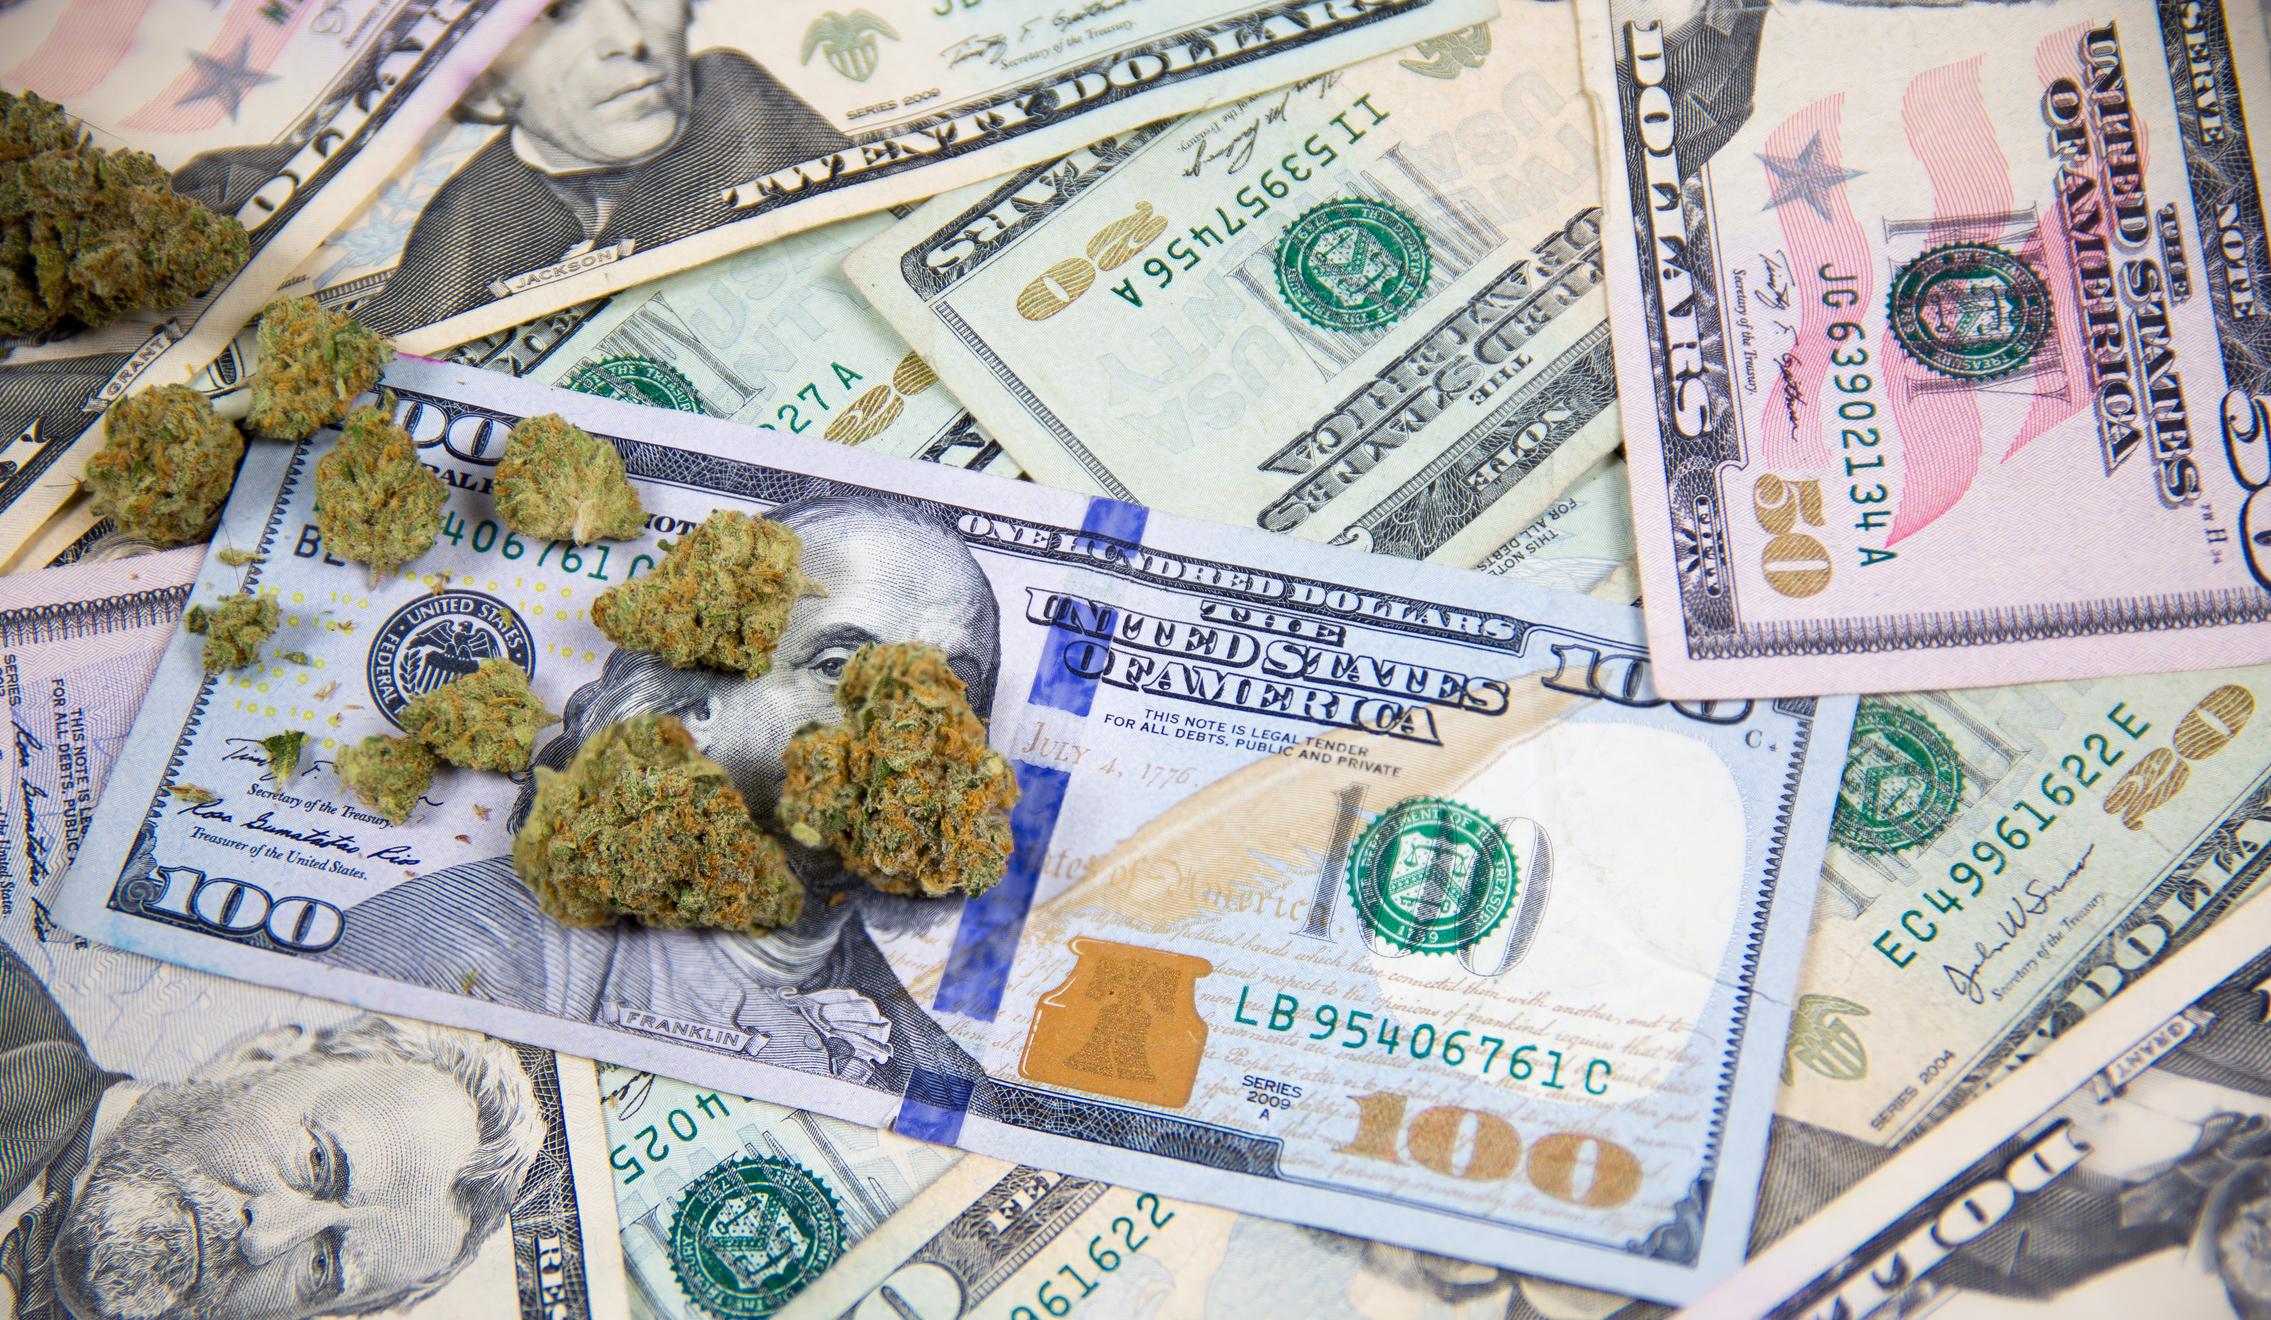 Marijuana buds on top of a pile of cash.